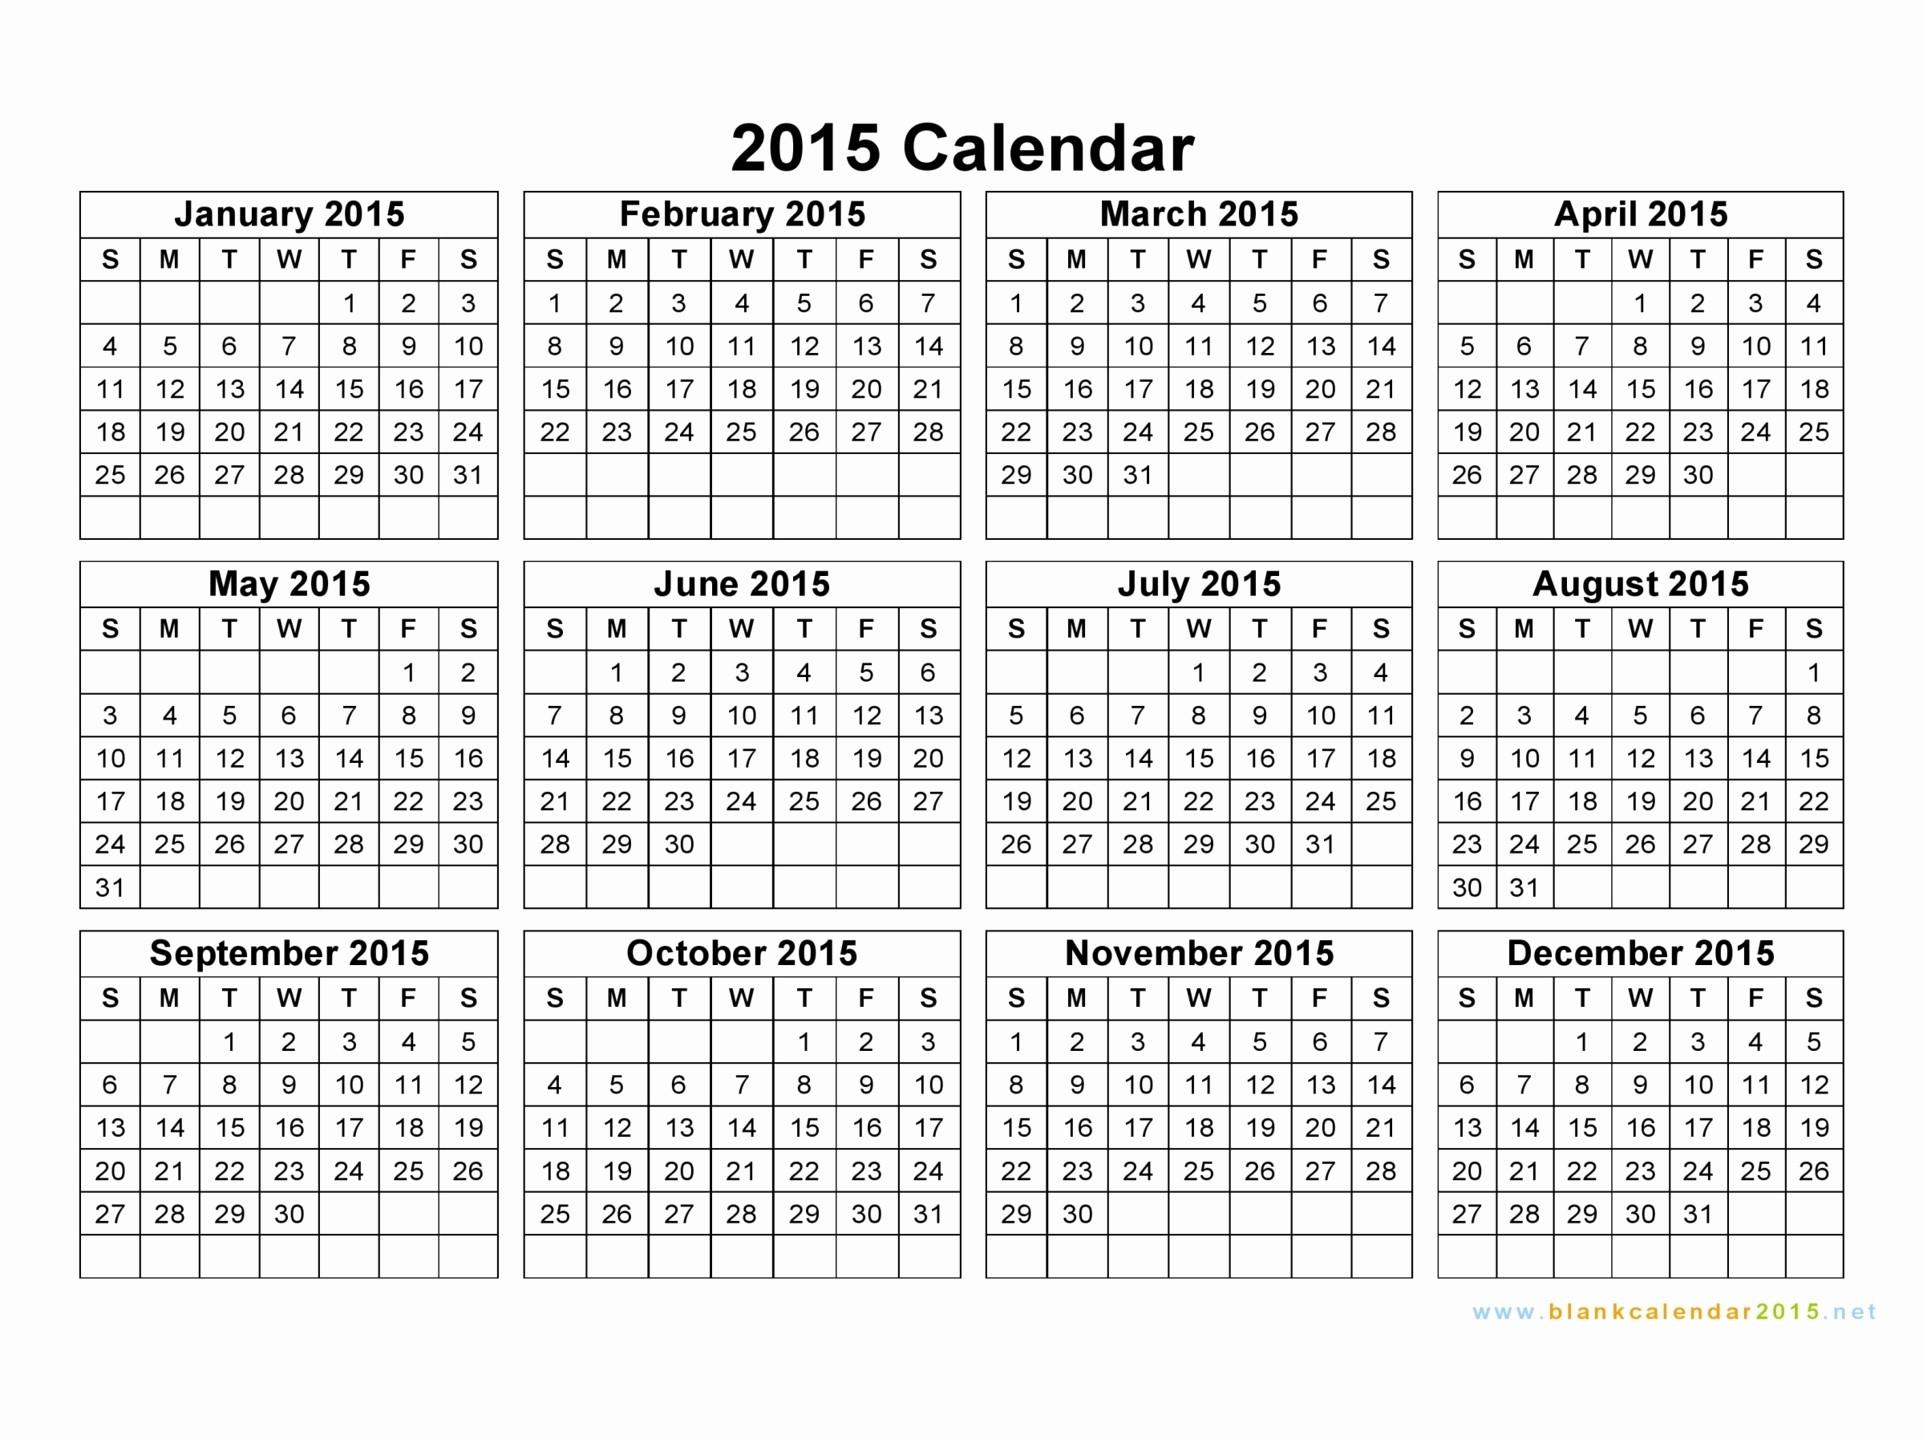 Free 2017 Yearly Calendar Template Luxury Free Printable Yearly Calendar 2015 – 2017 Printable Calendar